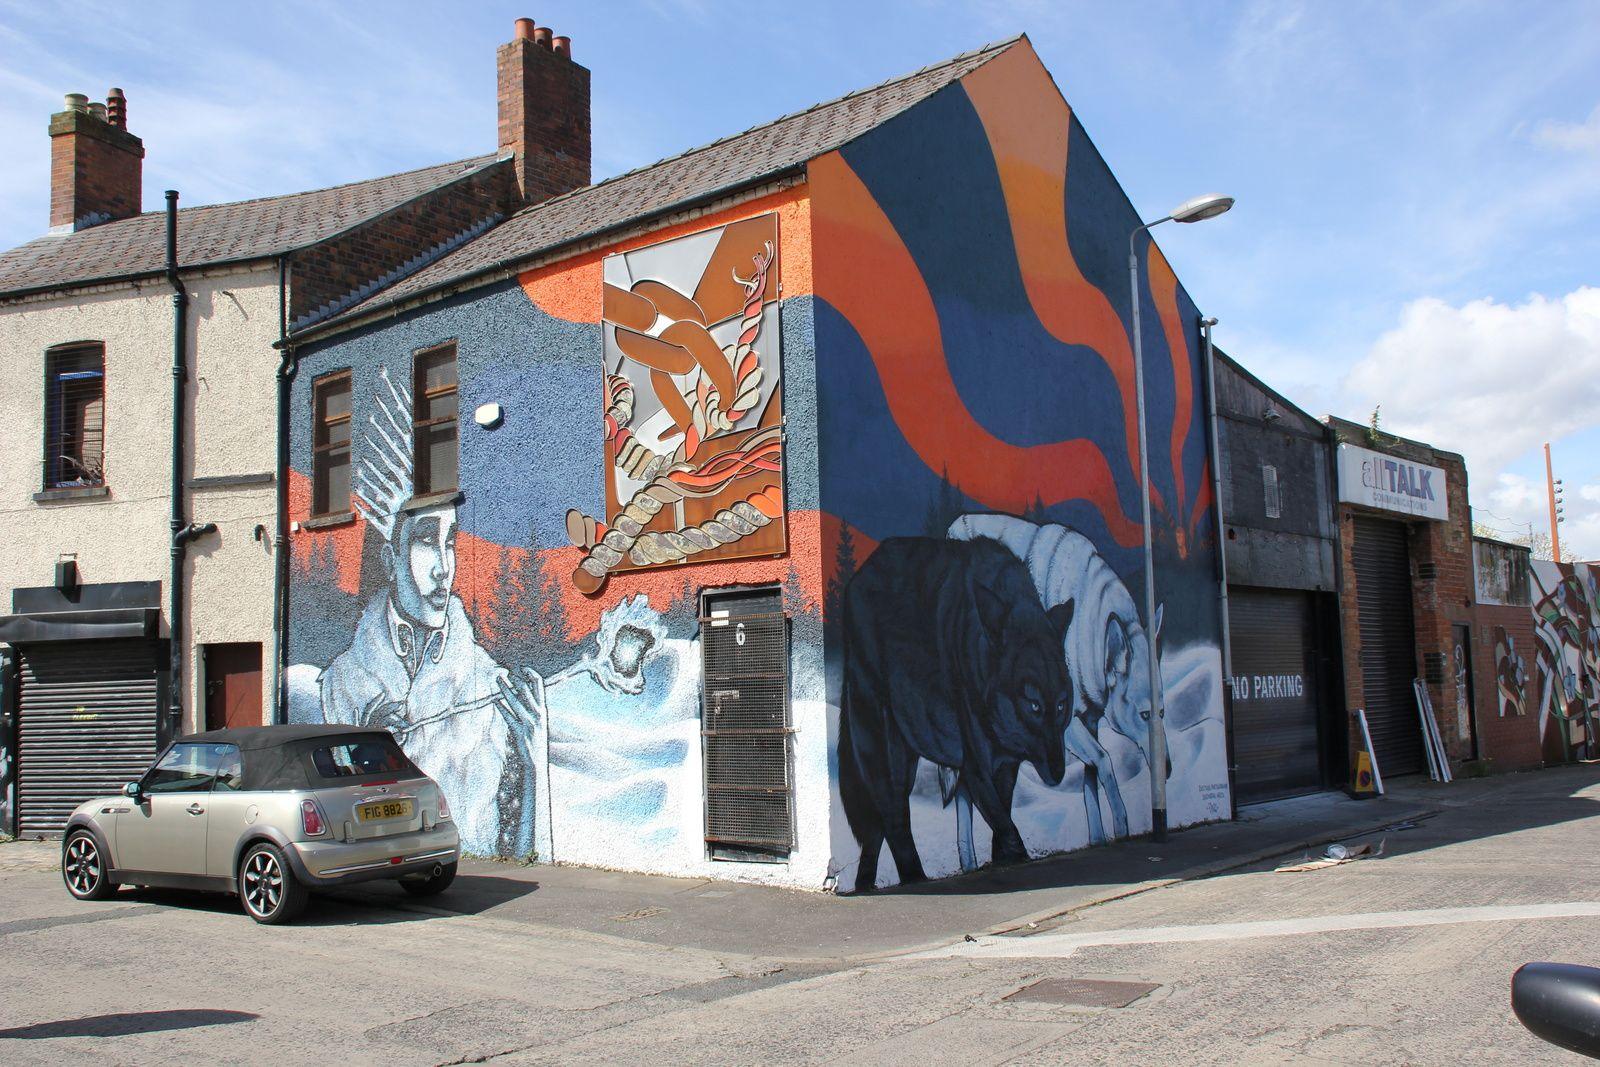 761) Connswater street/Newtownards road, East Belfast